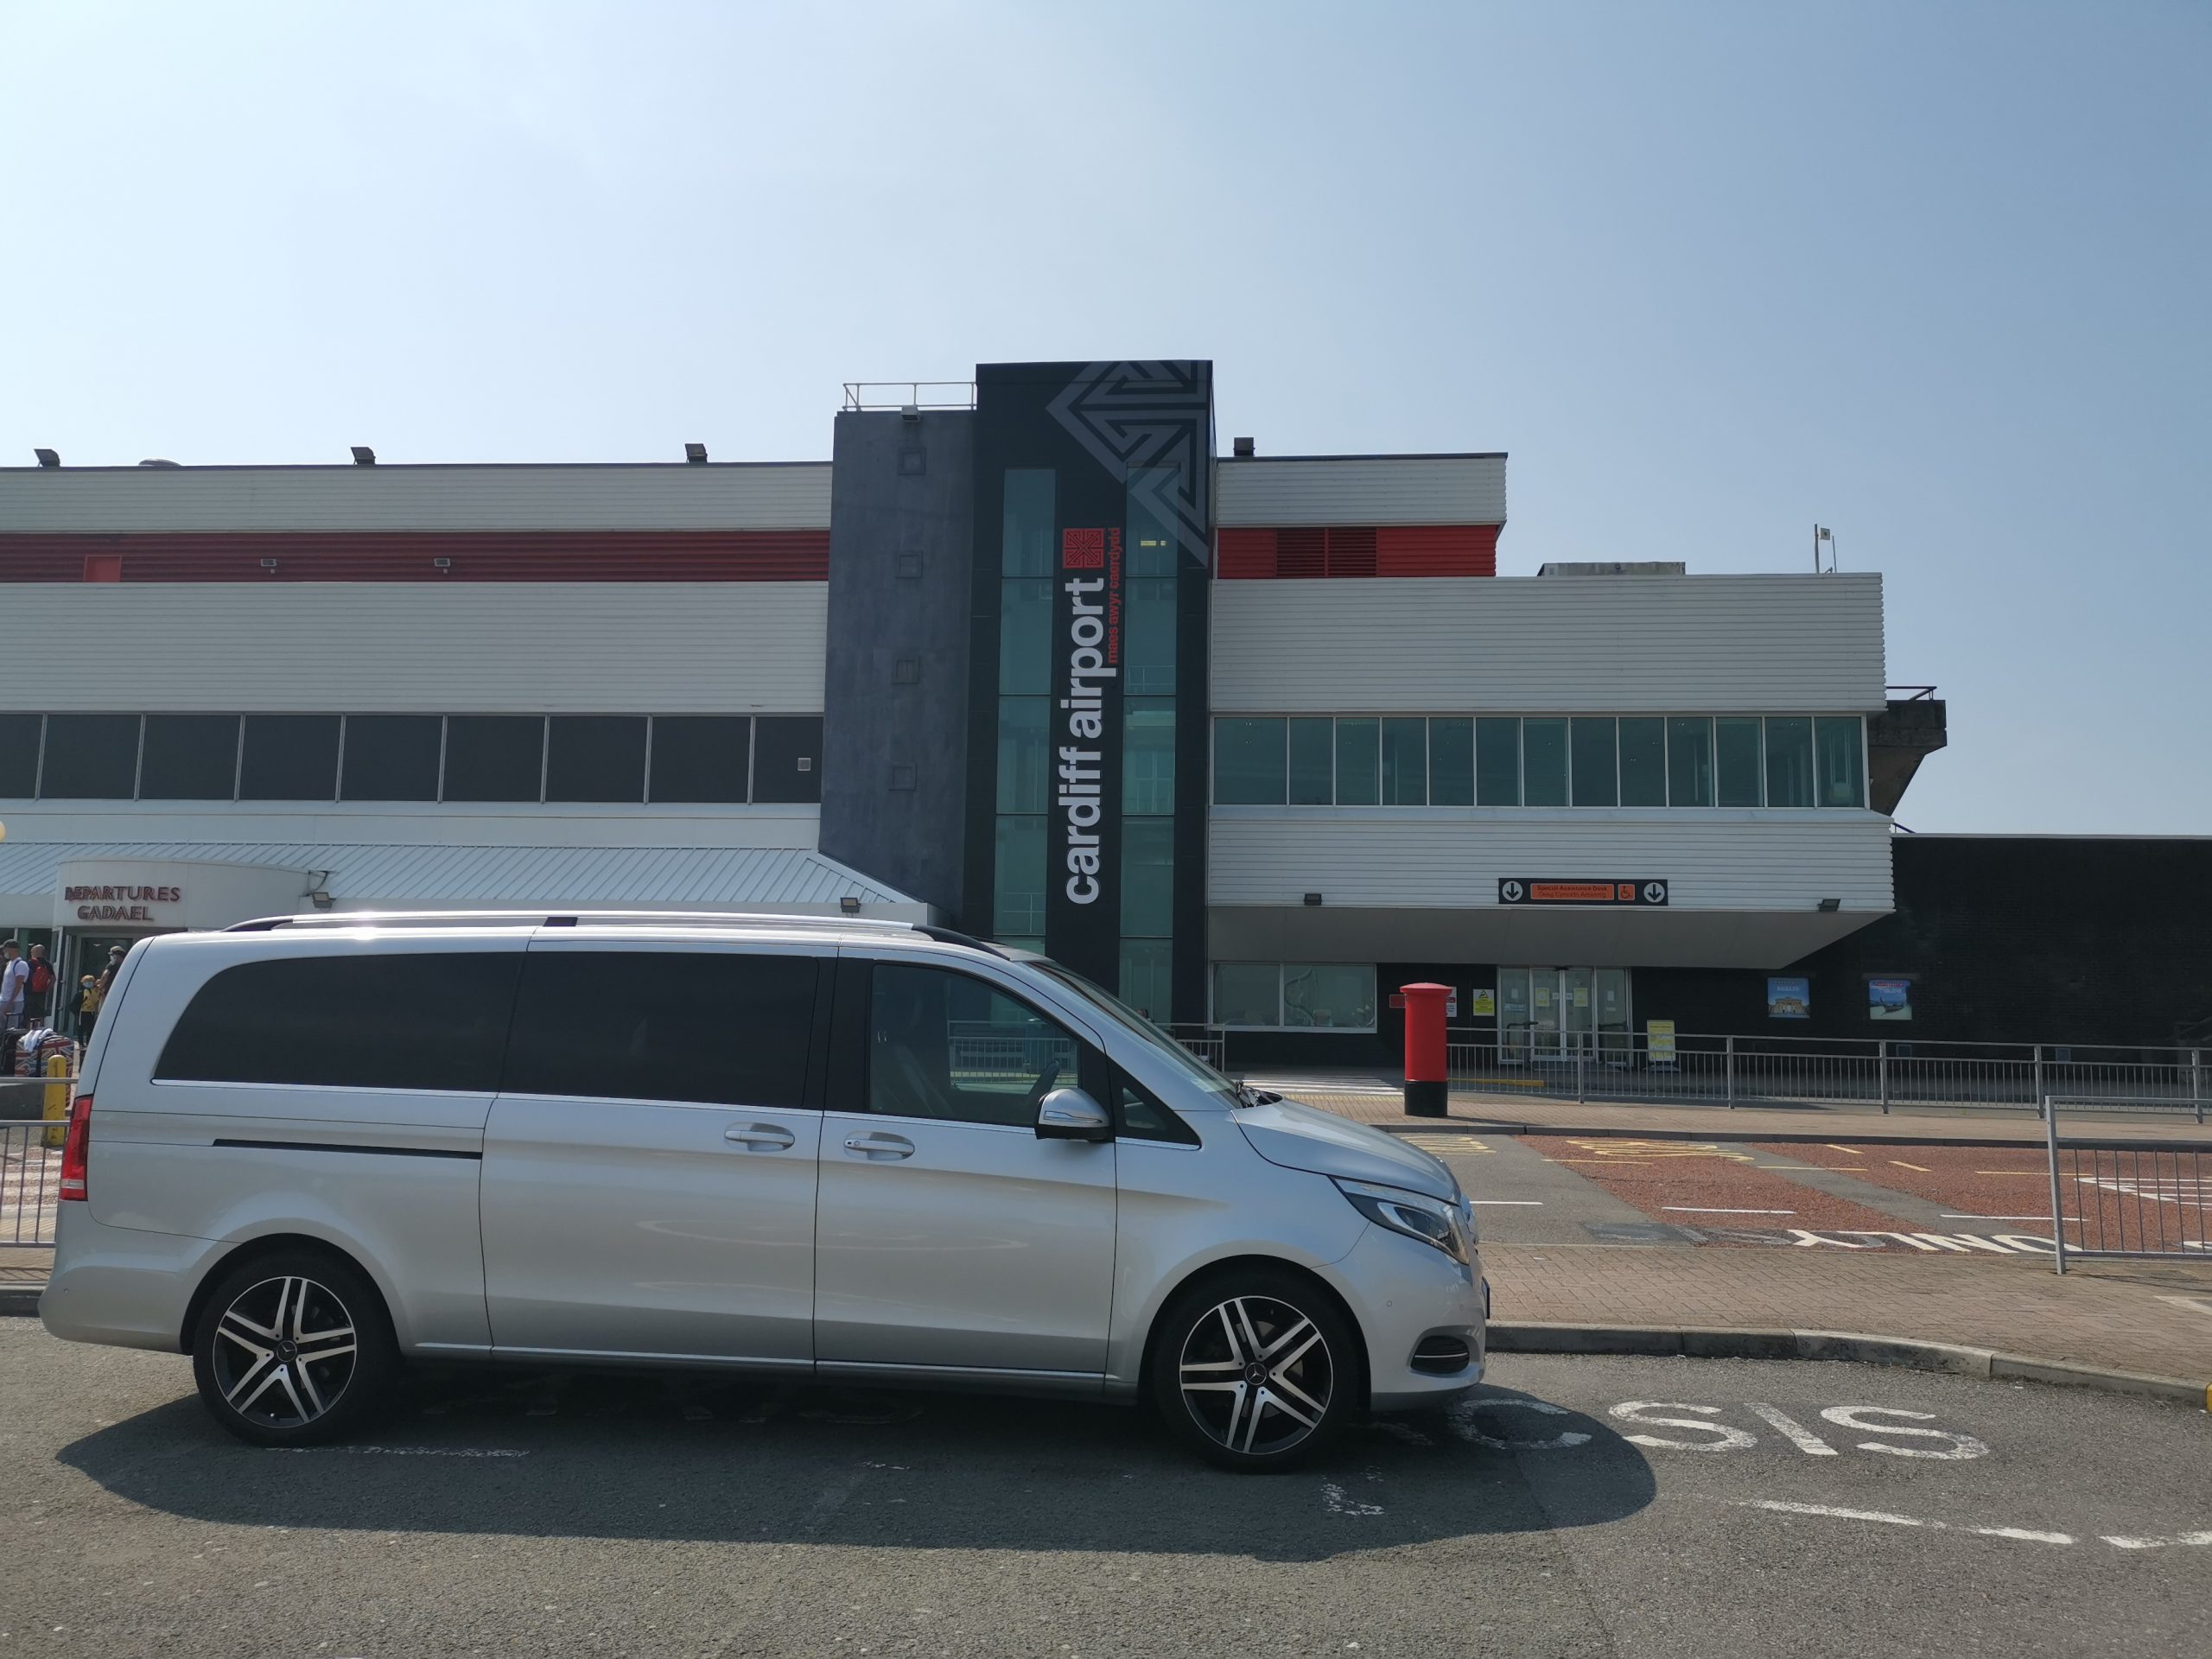 Cardiff Airport Chauffeur Service